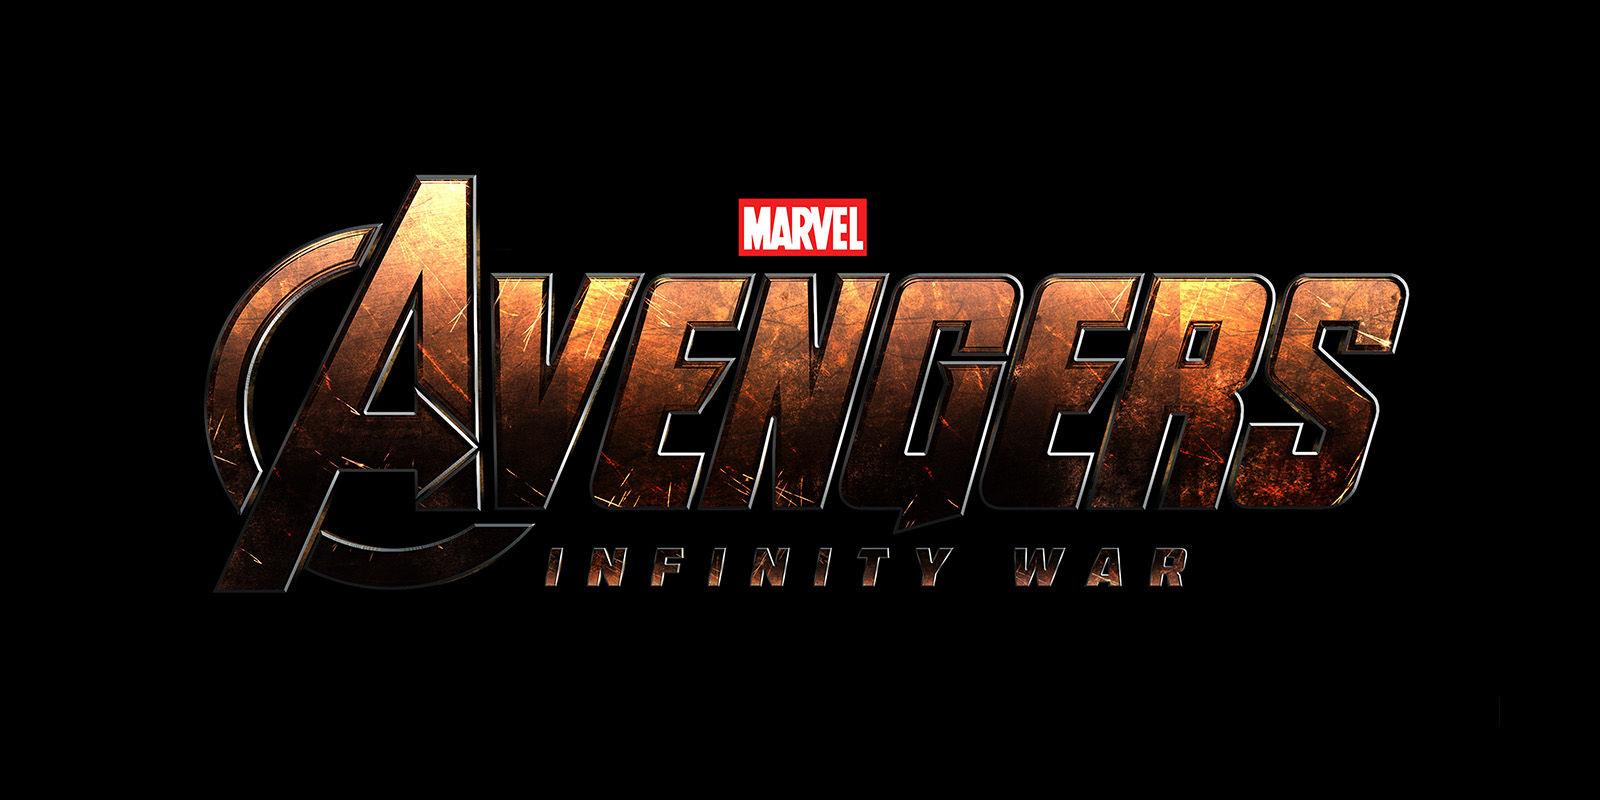 Avengers: Infinity War Casting Call Confirms Captain Marvel, Guardians